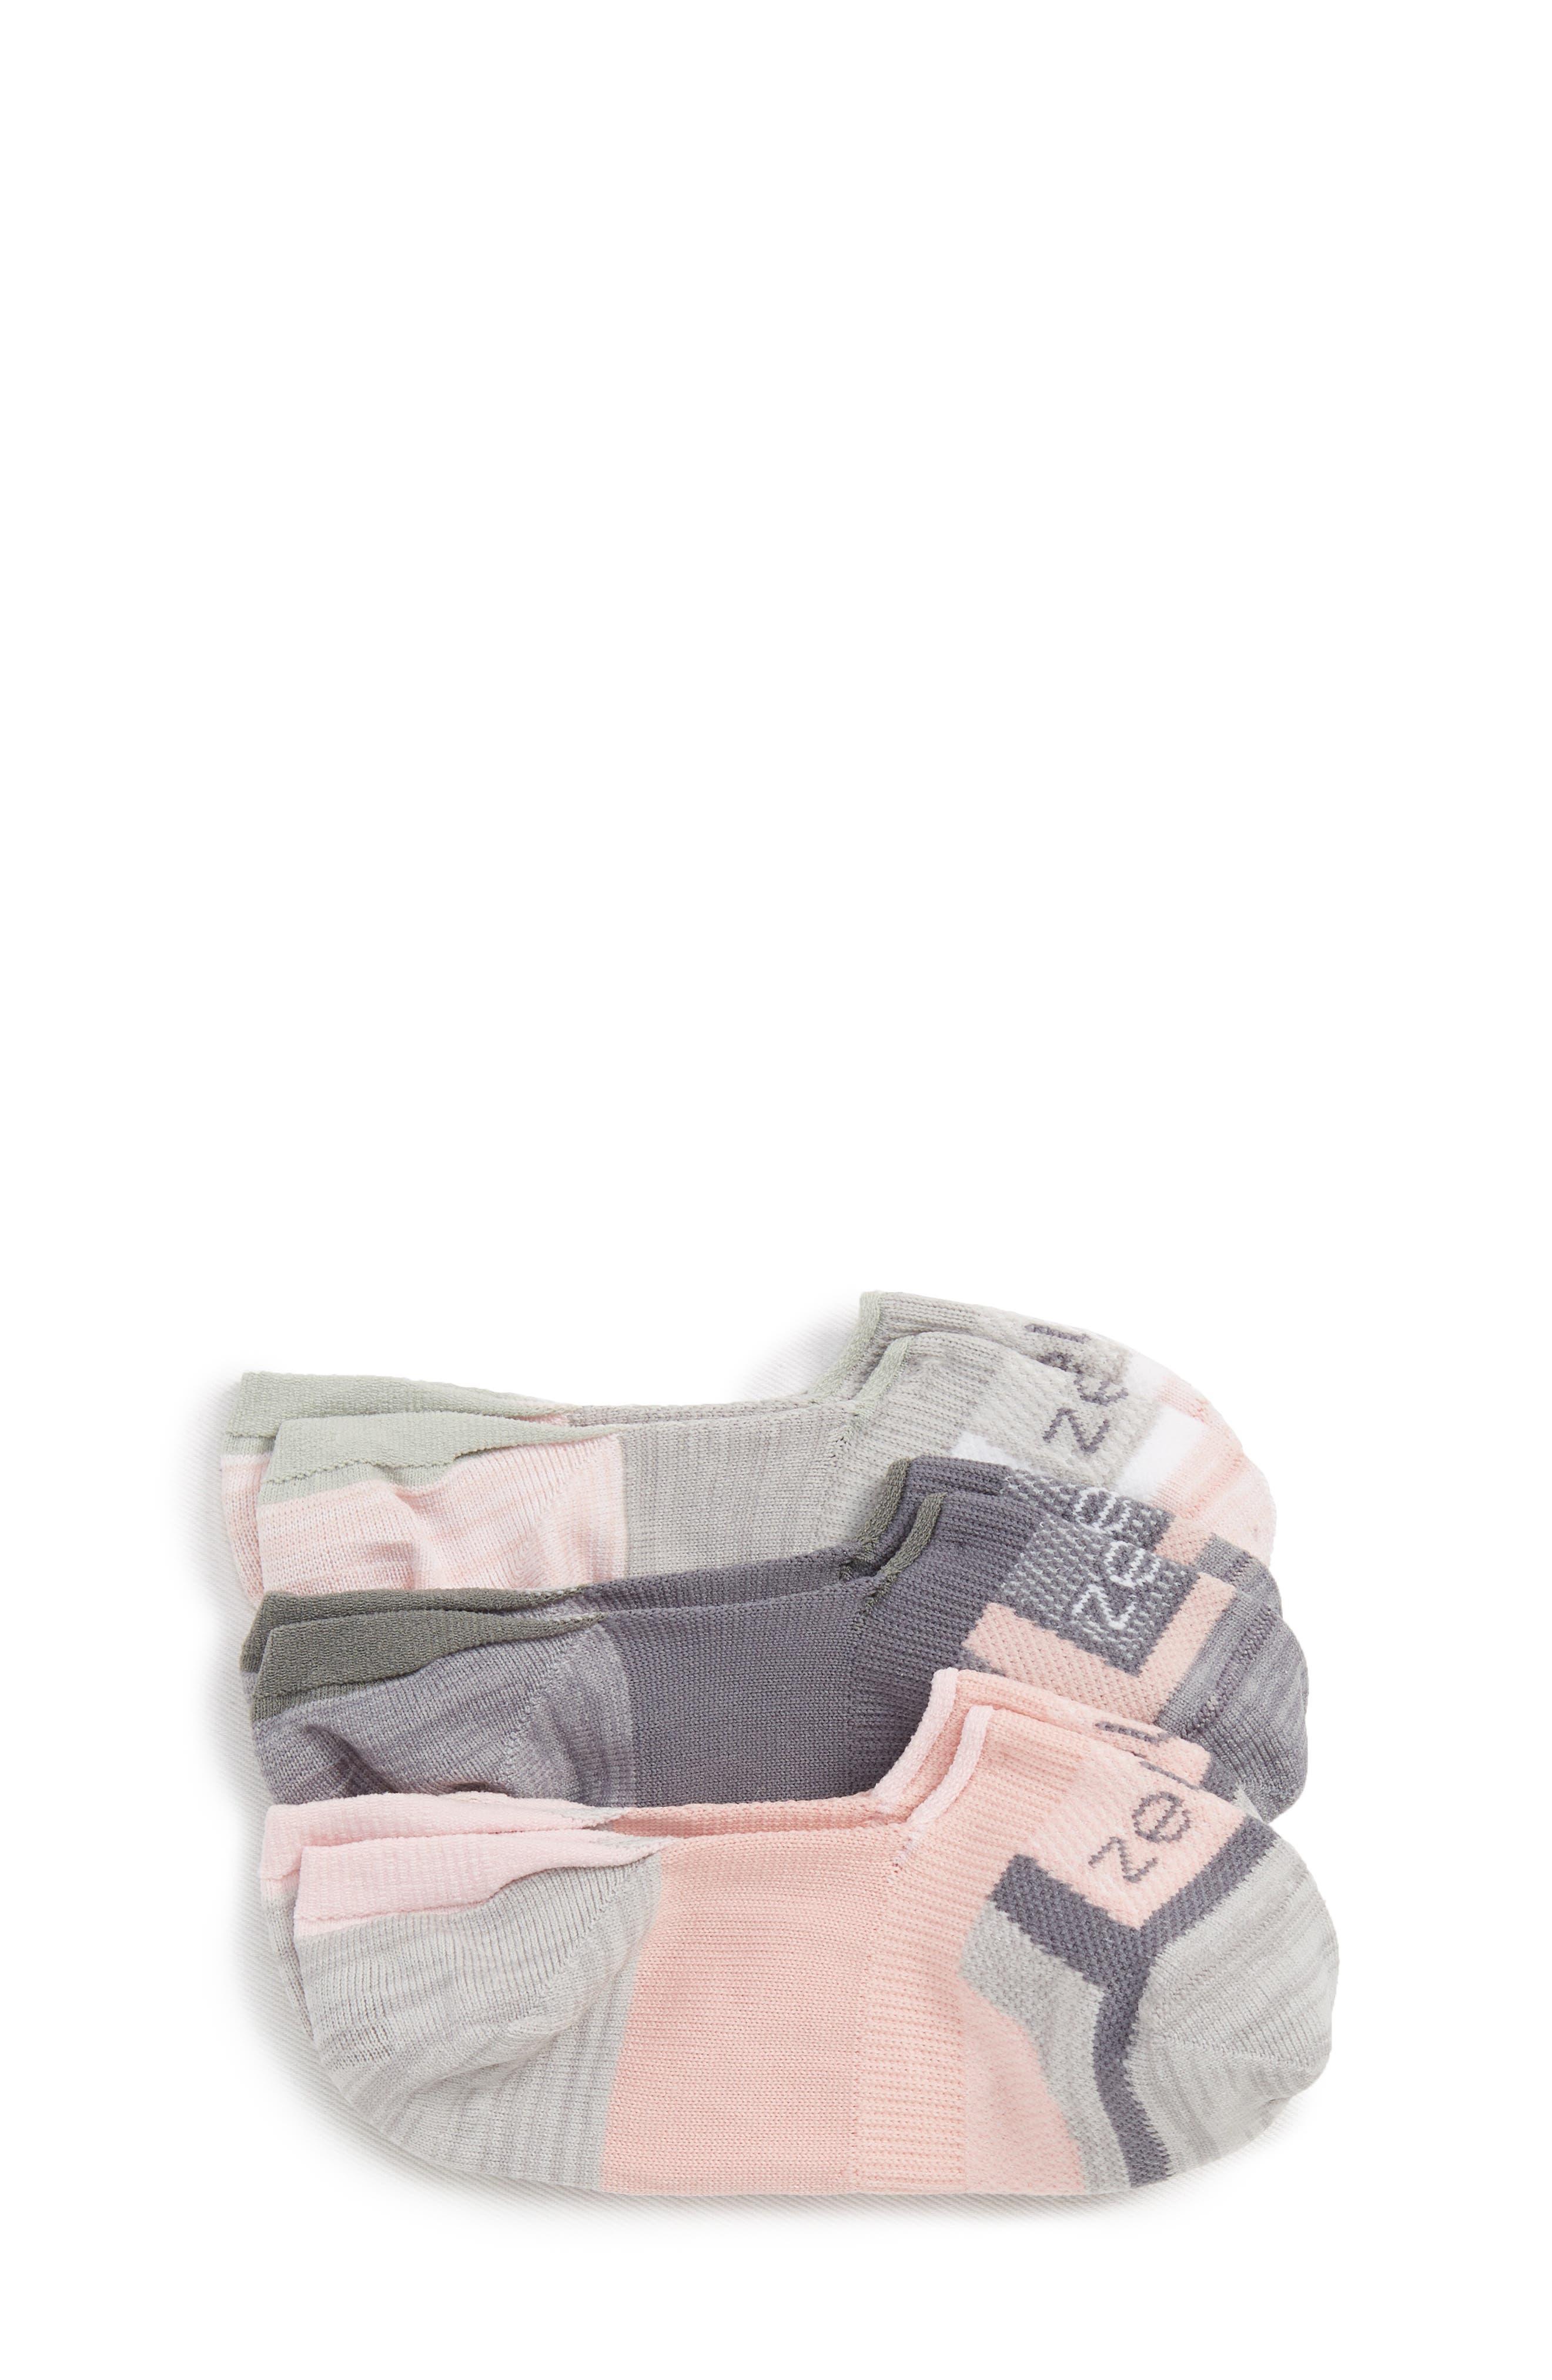 ZELLA GIRL,                             Secret 3-Pack No-Show Socks,                             Main thumbnail 1, color,                             680